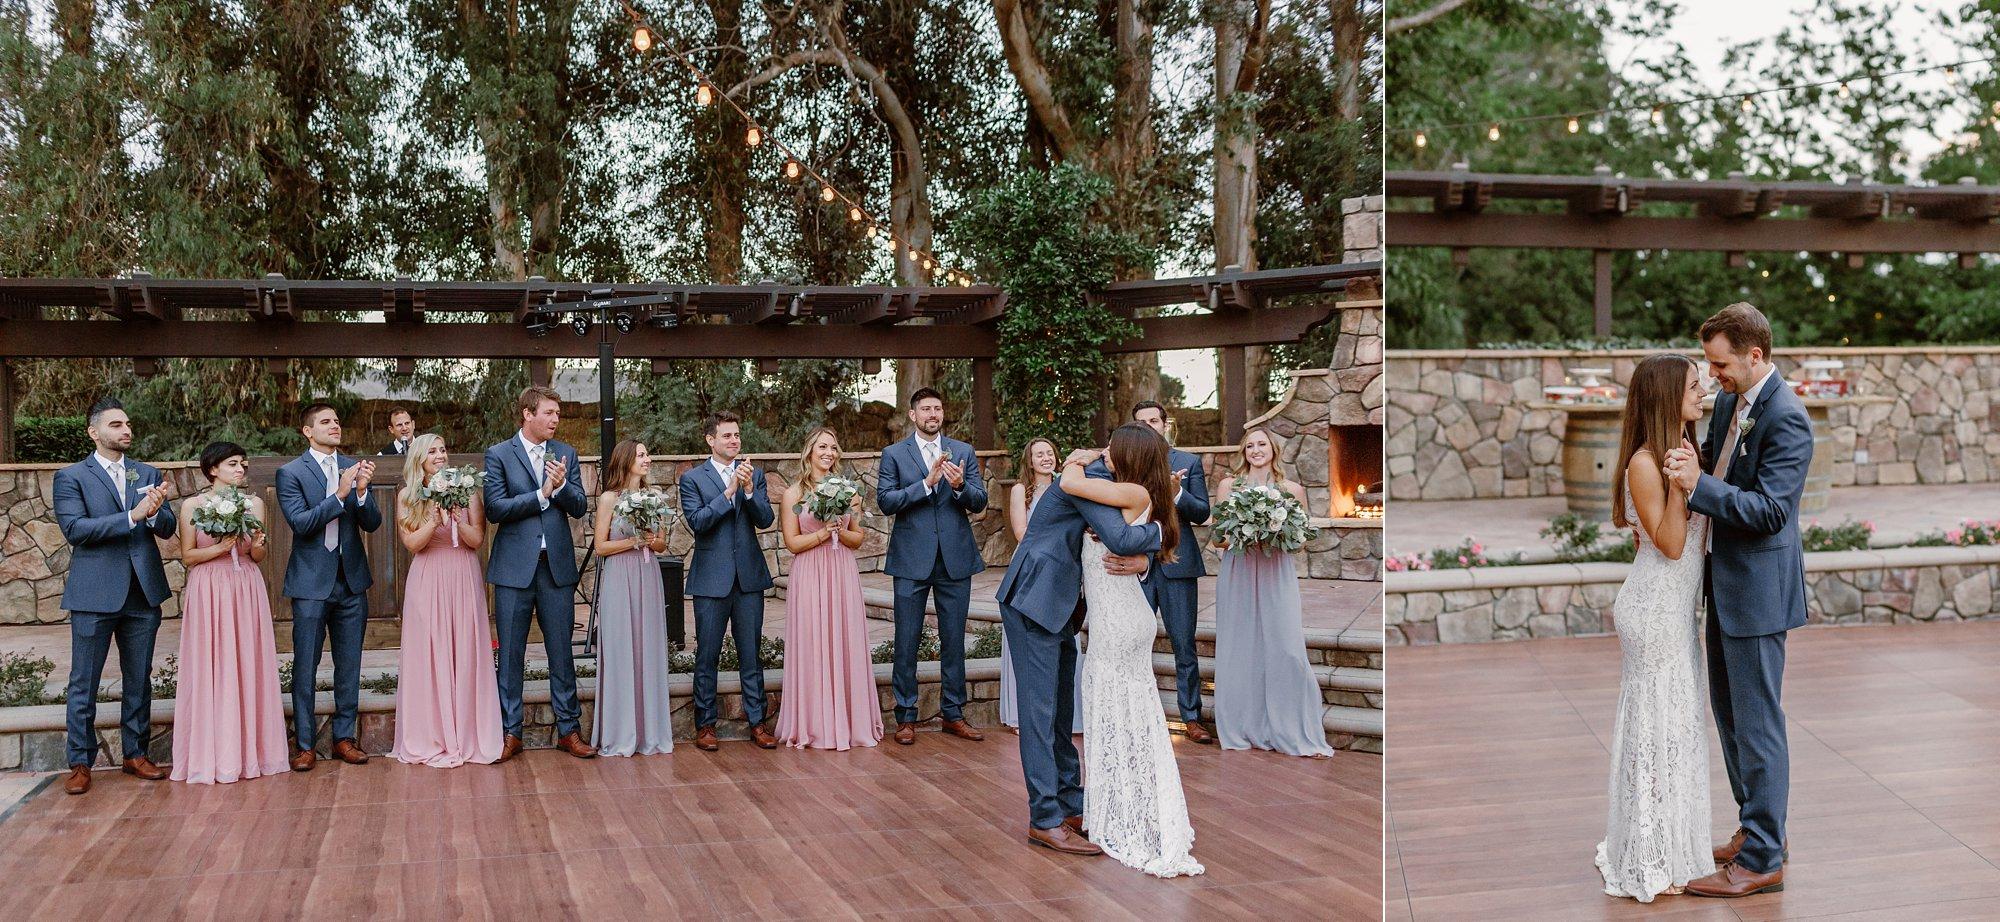 Walnut Grove Moorpark California Wedding_0078.jpg